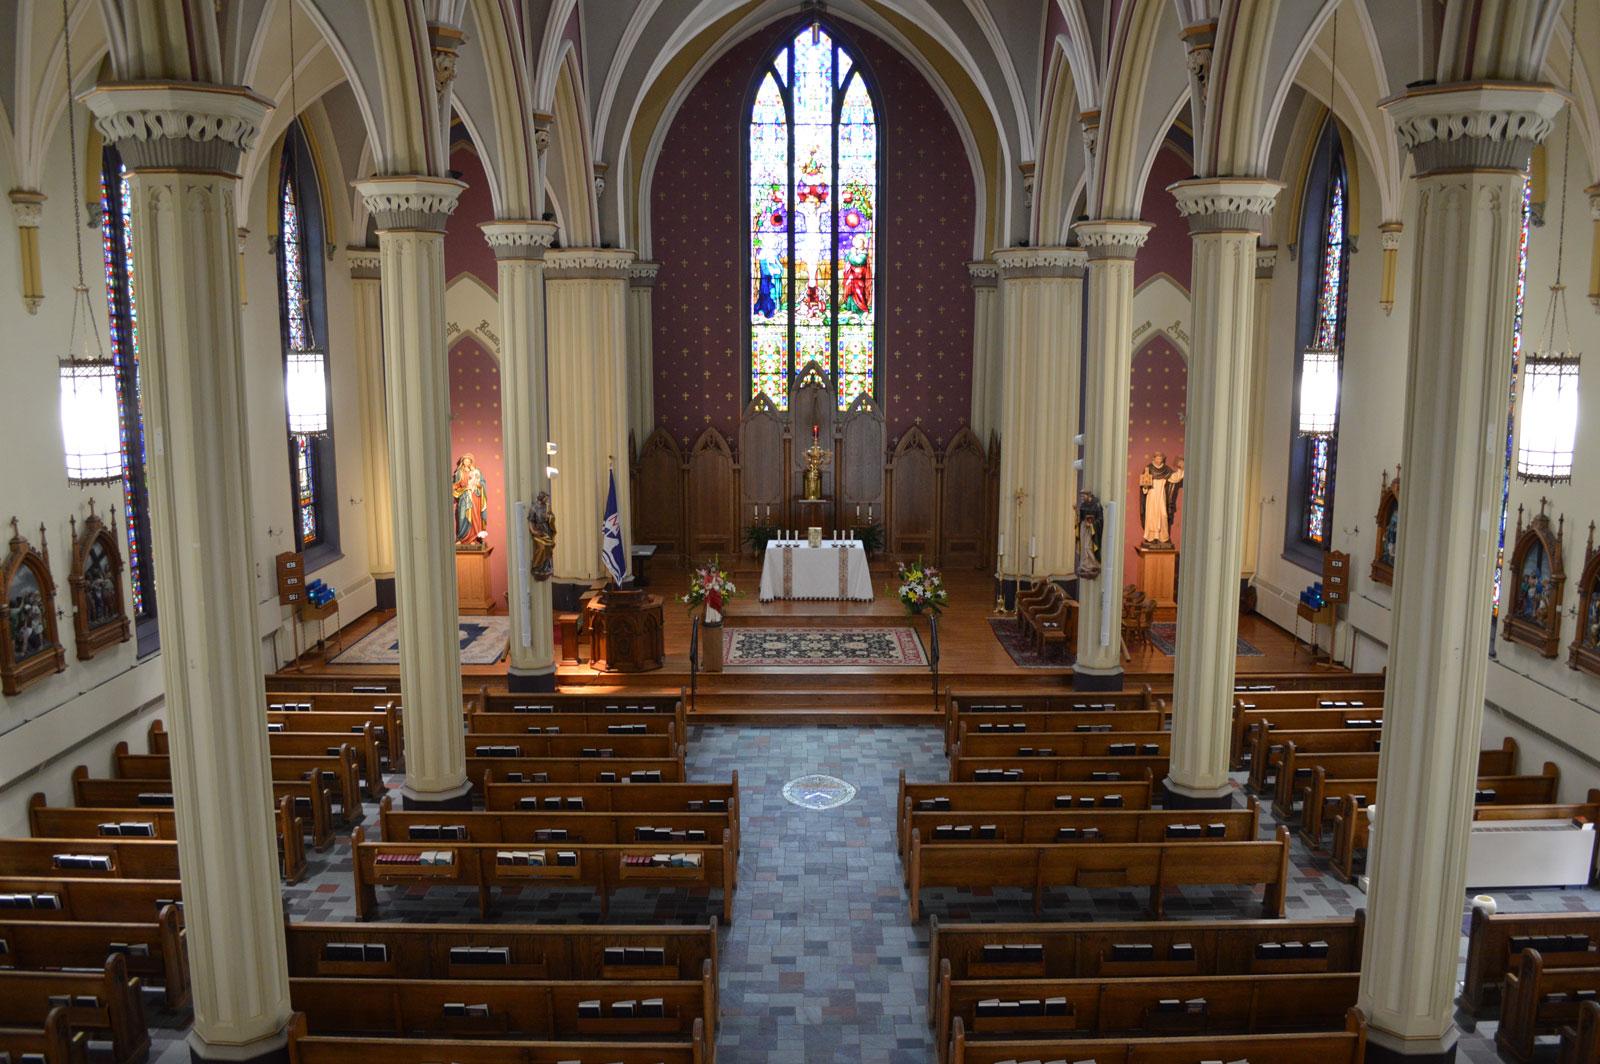 Saint Thomas Aquinas Zanesville   Church Photo Tour